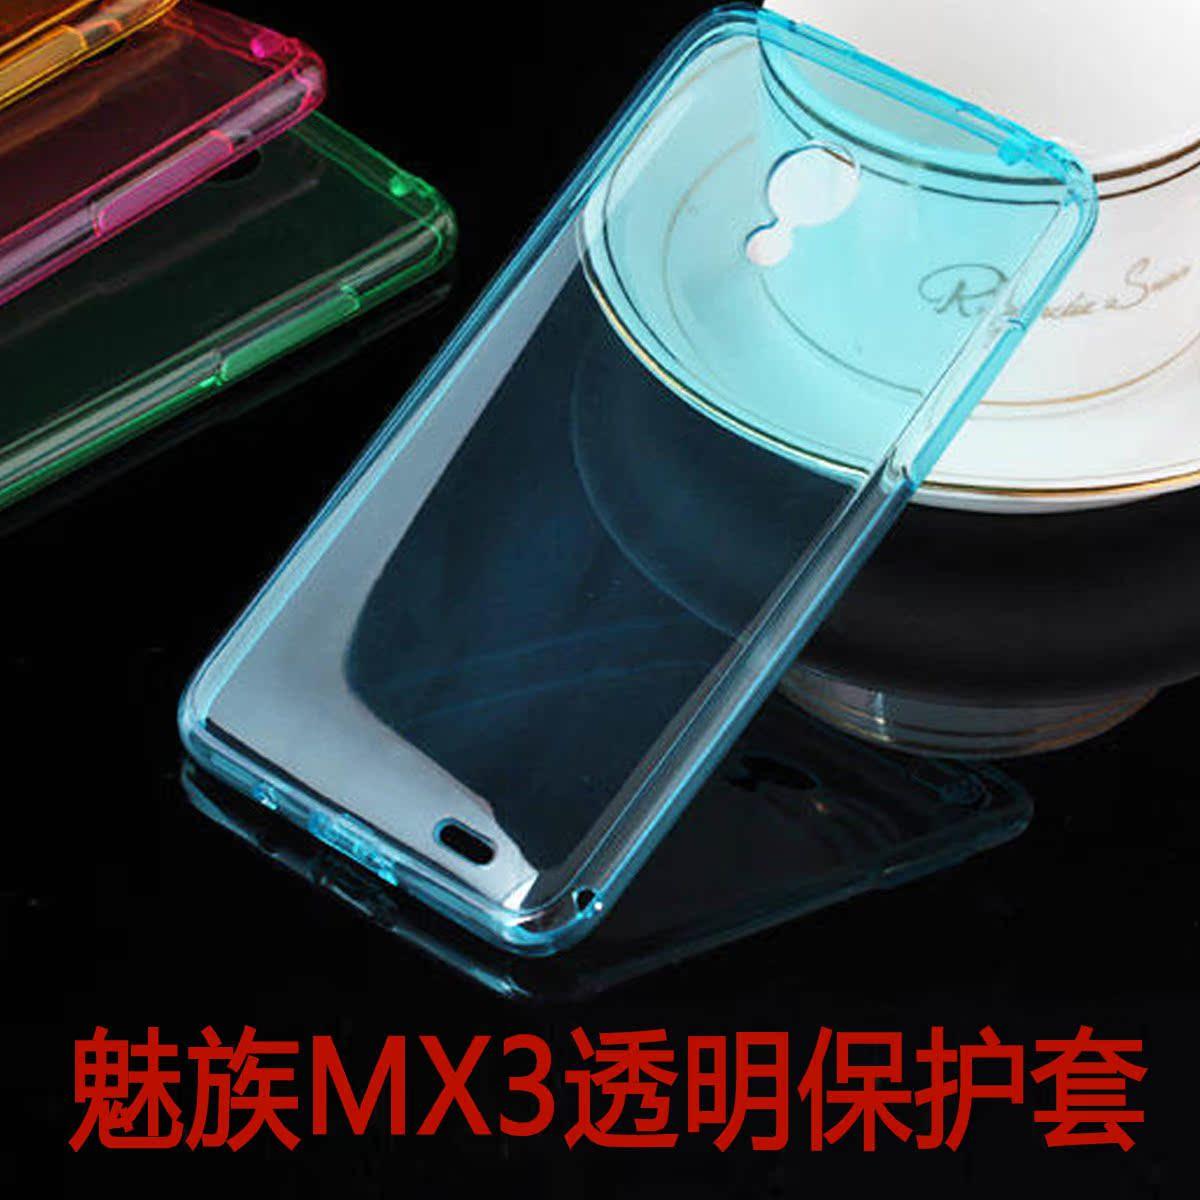 Чехлы, Накладки для телефонов, КПК Mei zu MEIZU MX3 MX4 TPU чехлы накладки для телефонов кпк dob mx4 pro